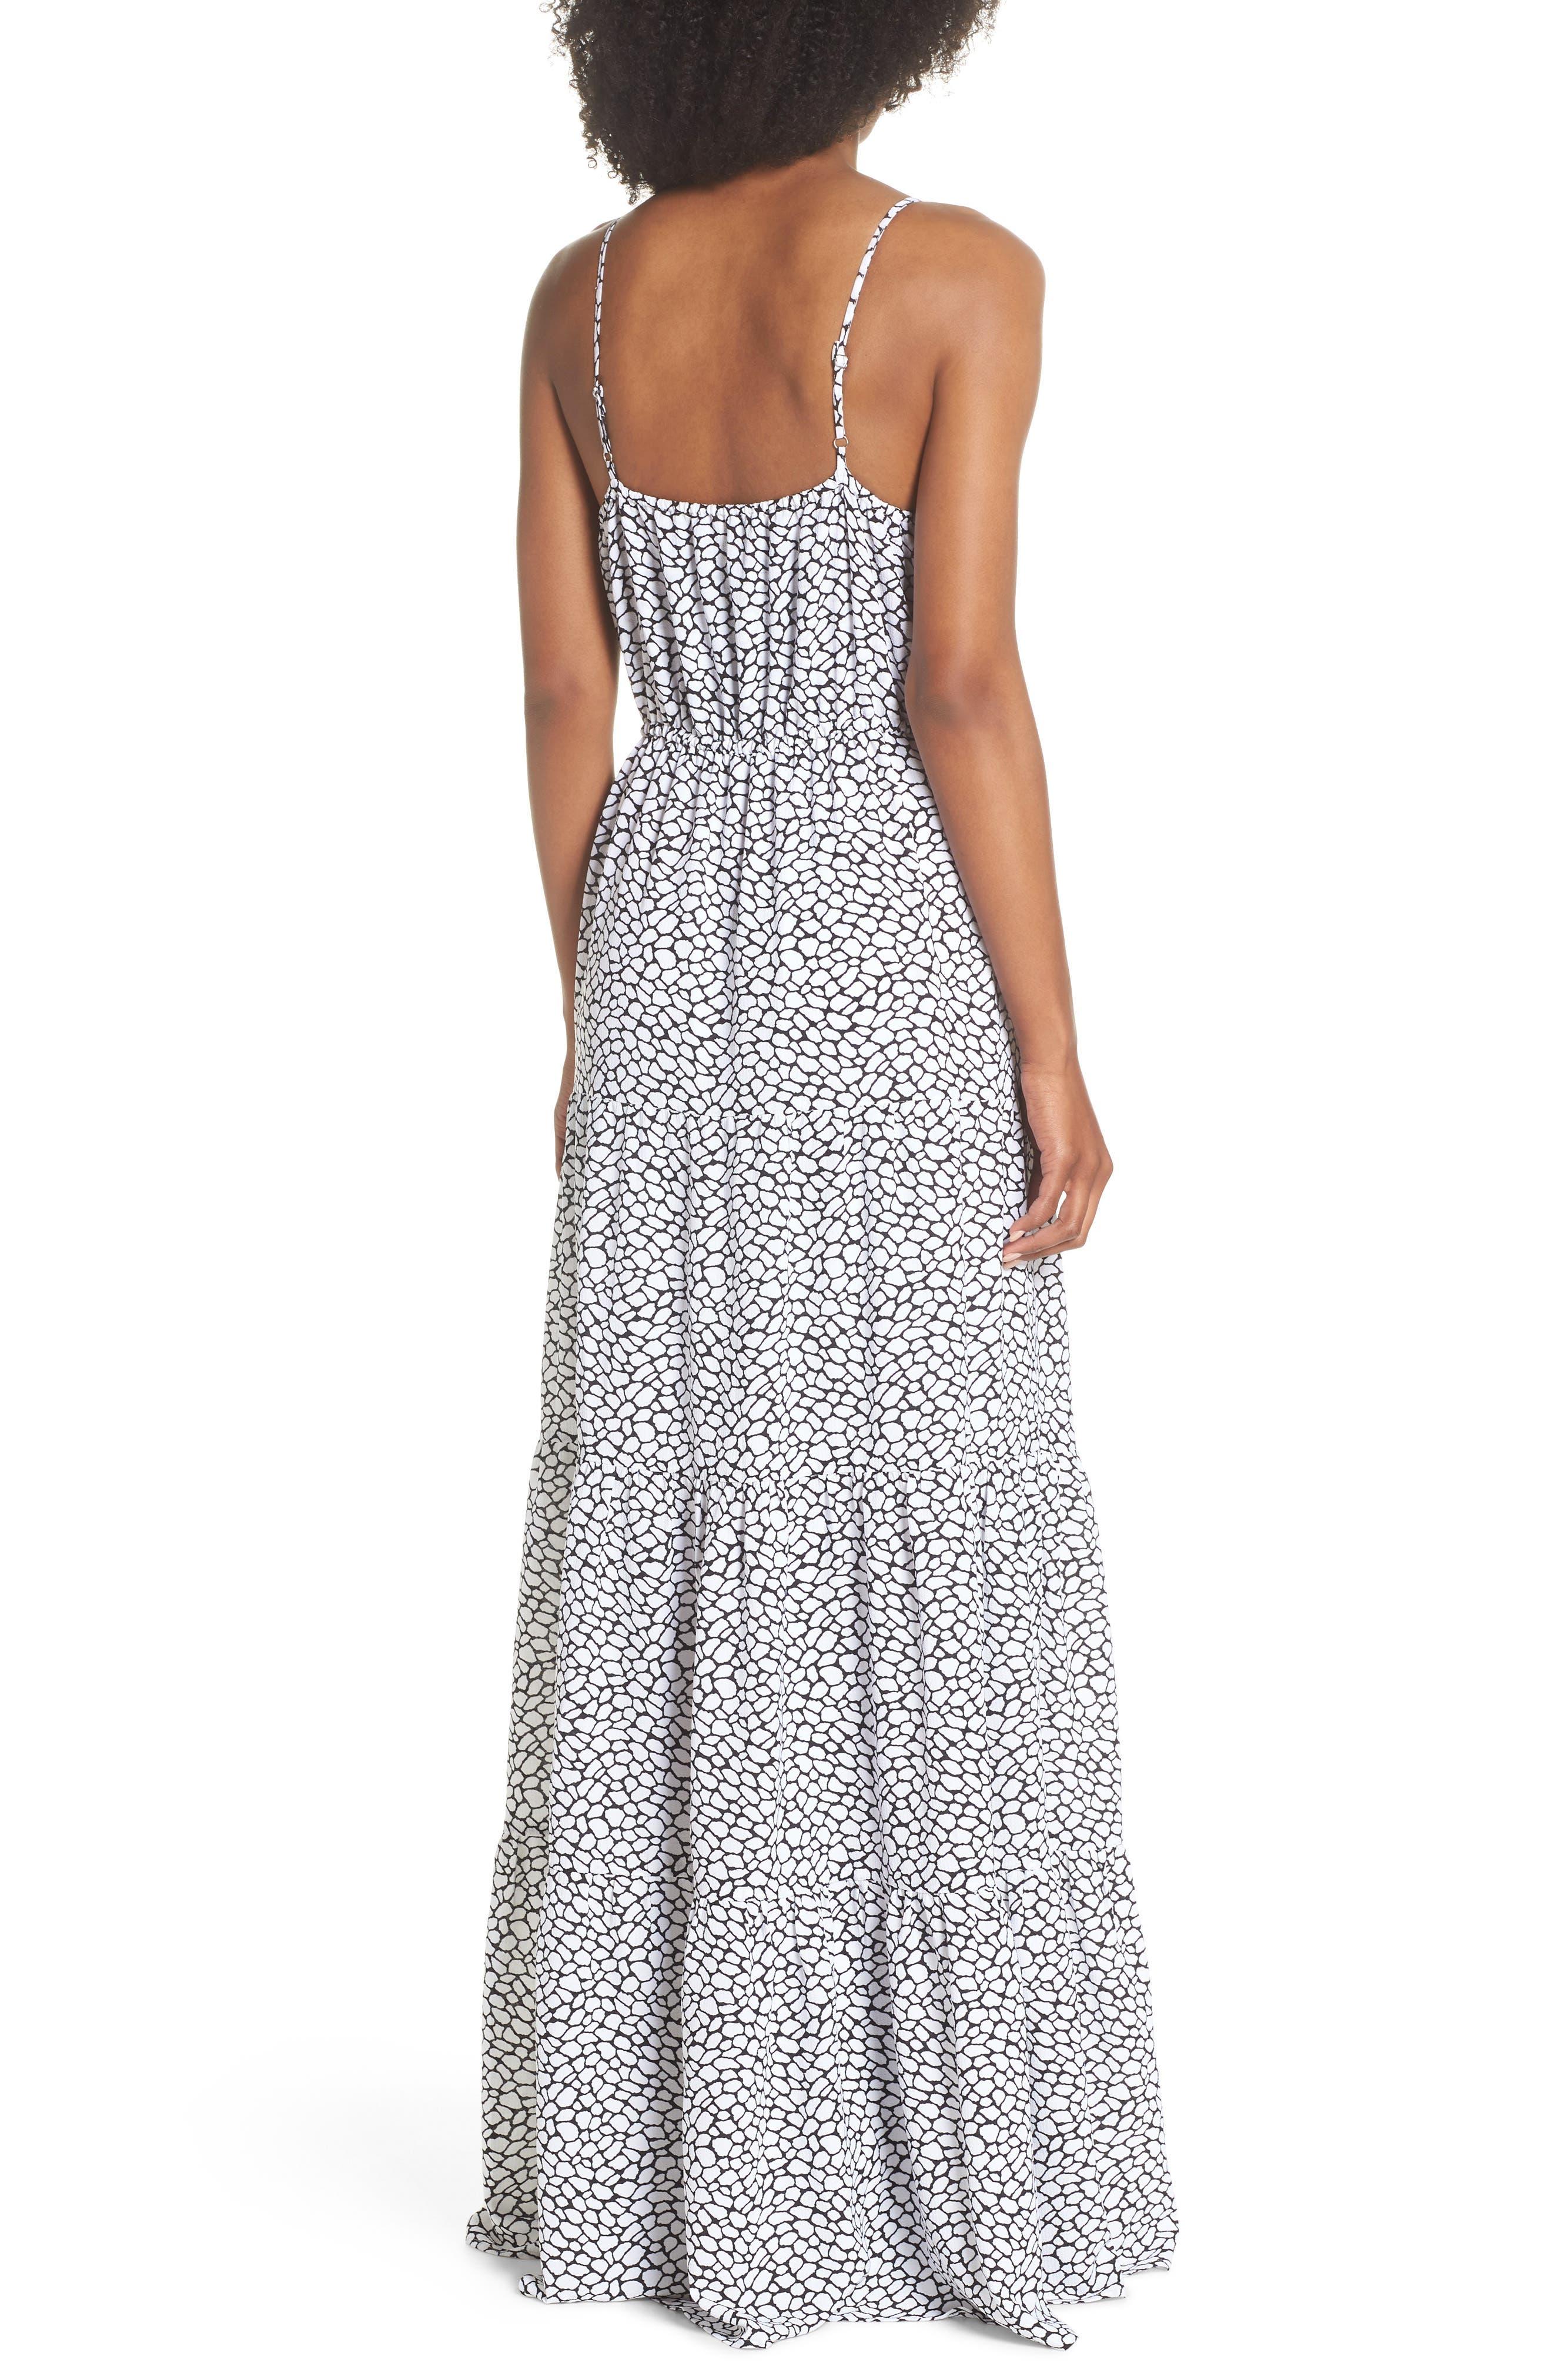 Tiered Maxi Dress,                             Alternate thumbnail 2, color,                             White/ Black